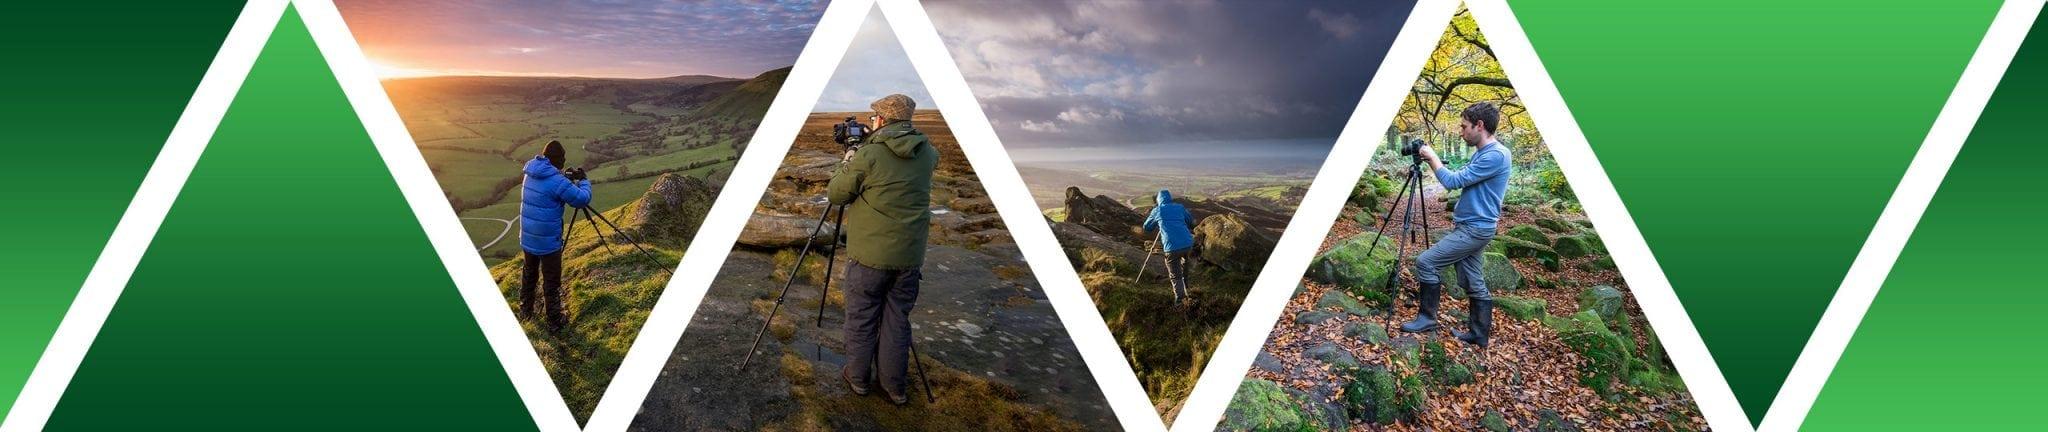 1-2-1 Peak District Photography Workshops